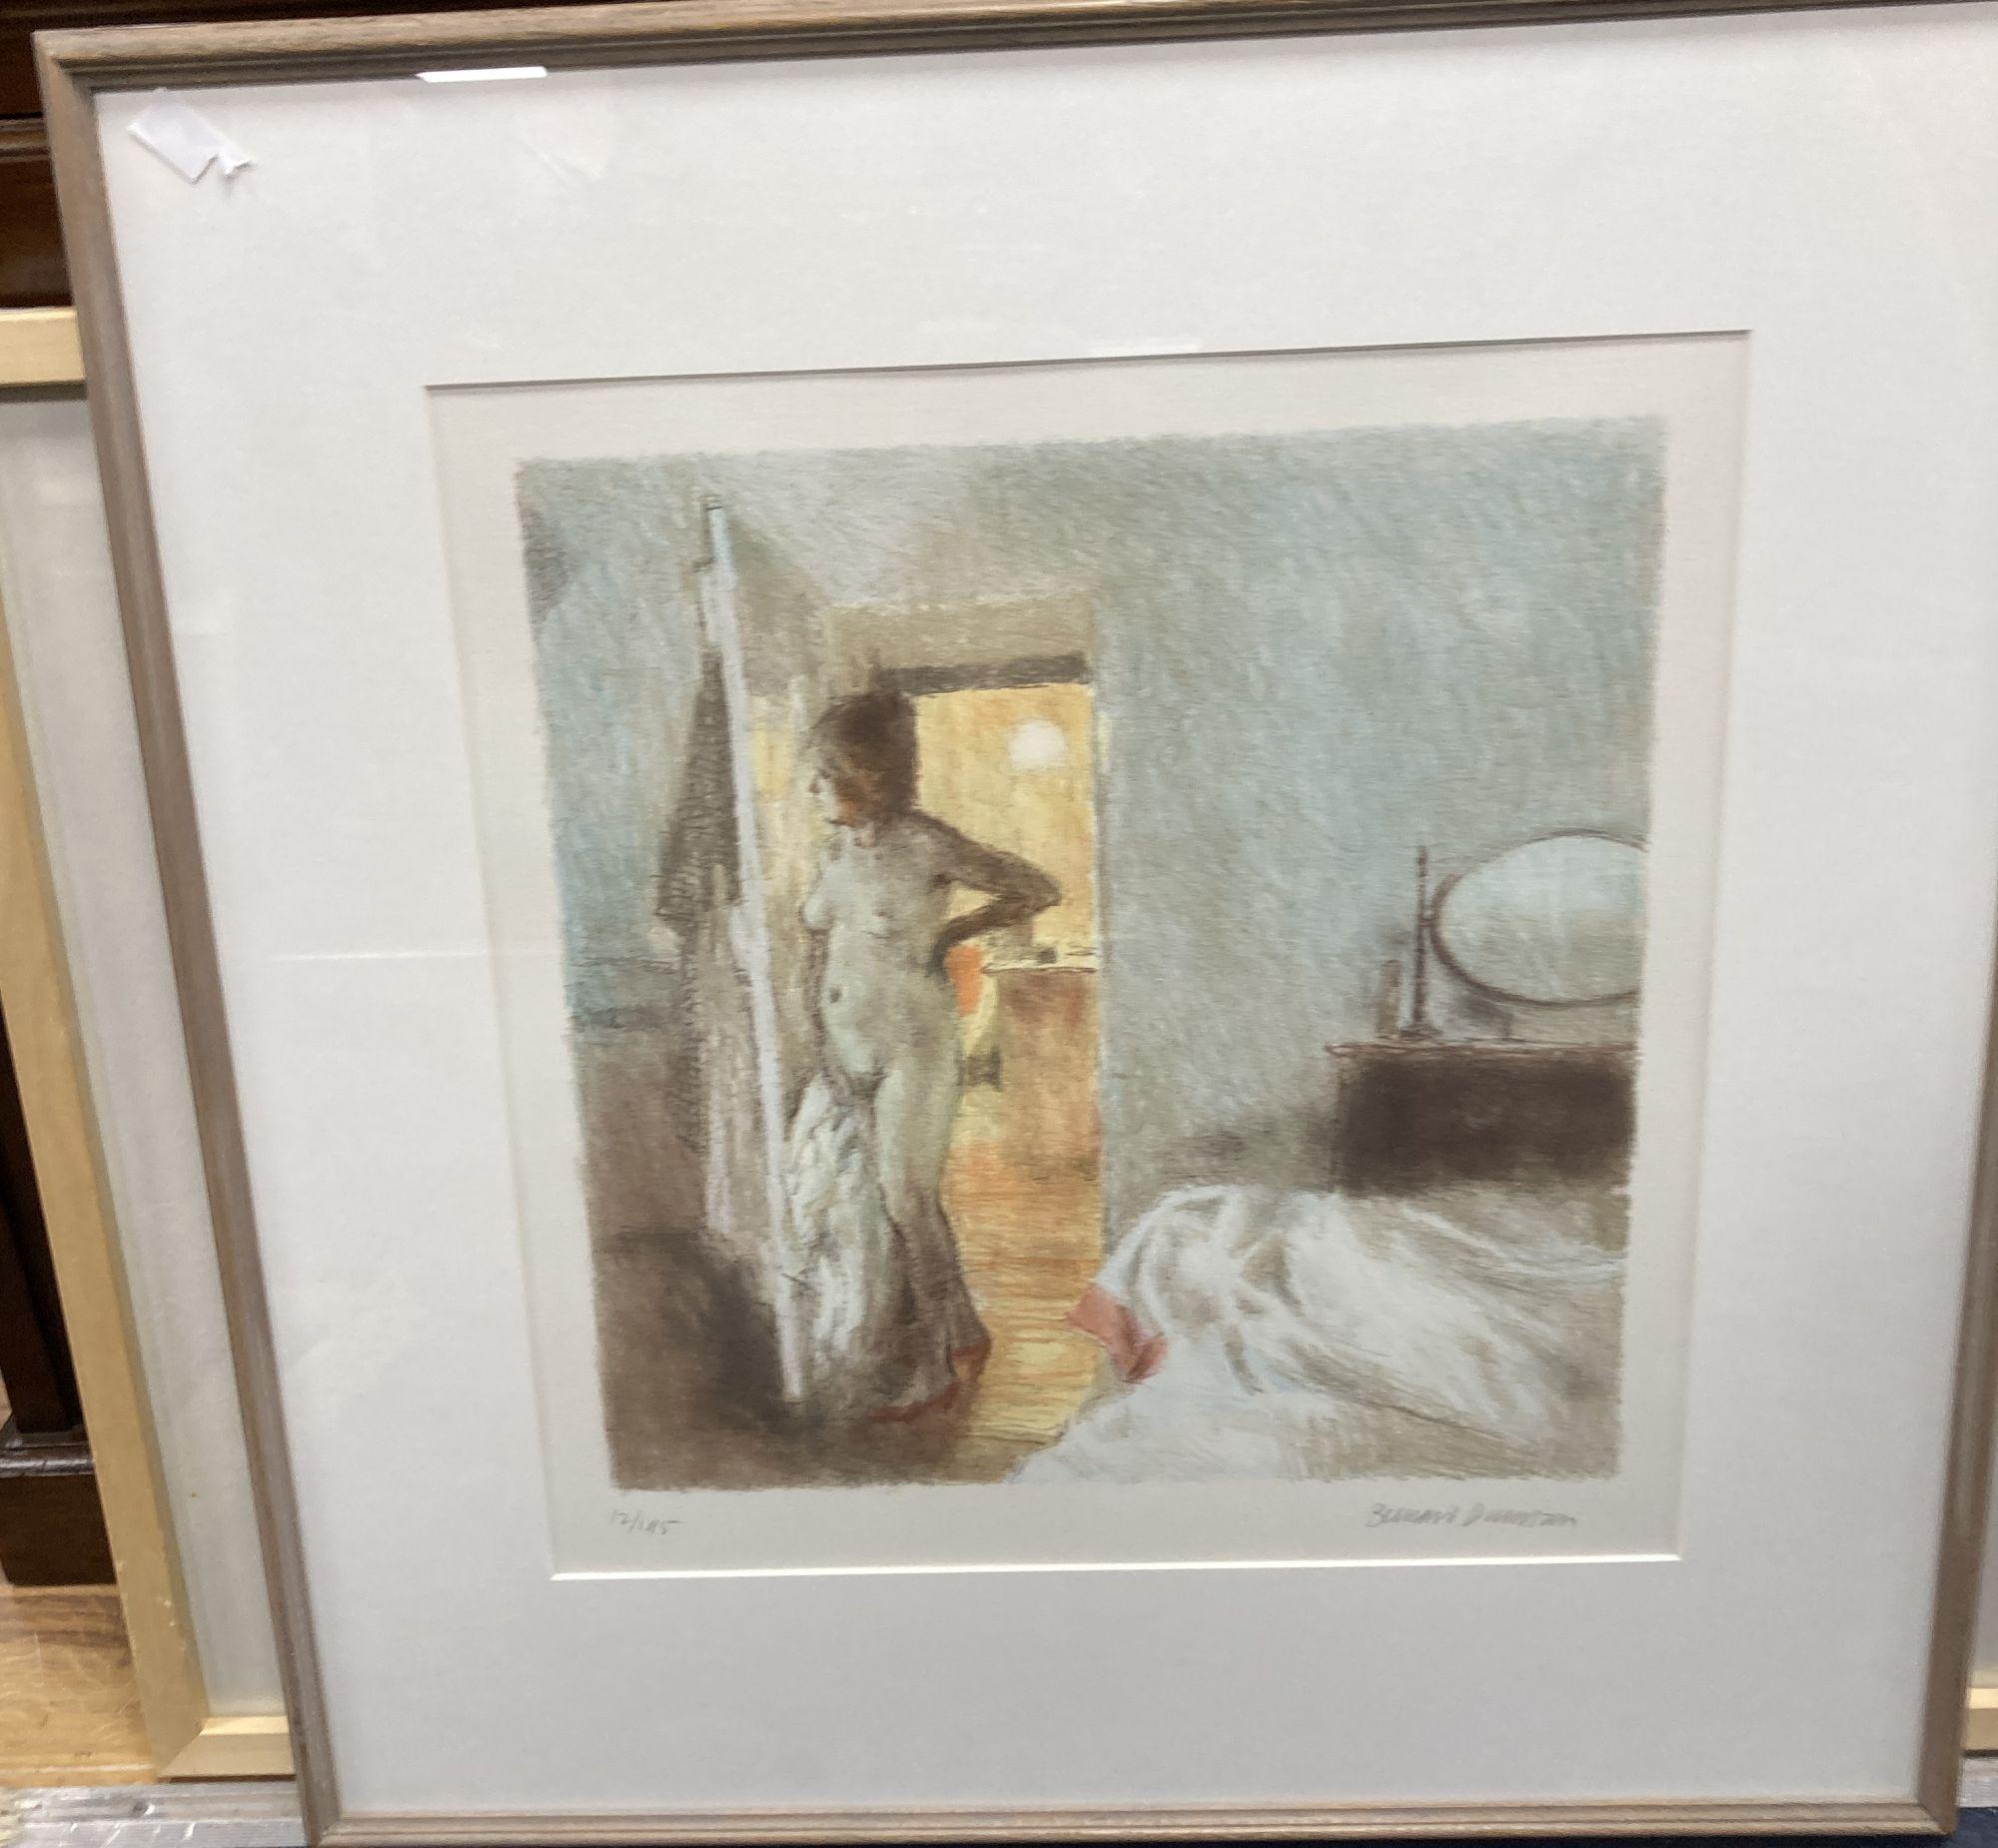 Bernard Dunstan (1920-2017), lithograph, 'Nude I', signed in pencil, 12/95, 40 x 39cm. - Image 2 of 4